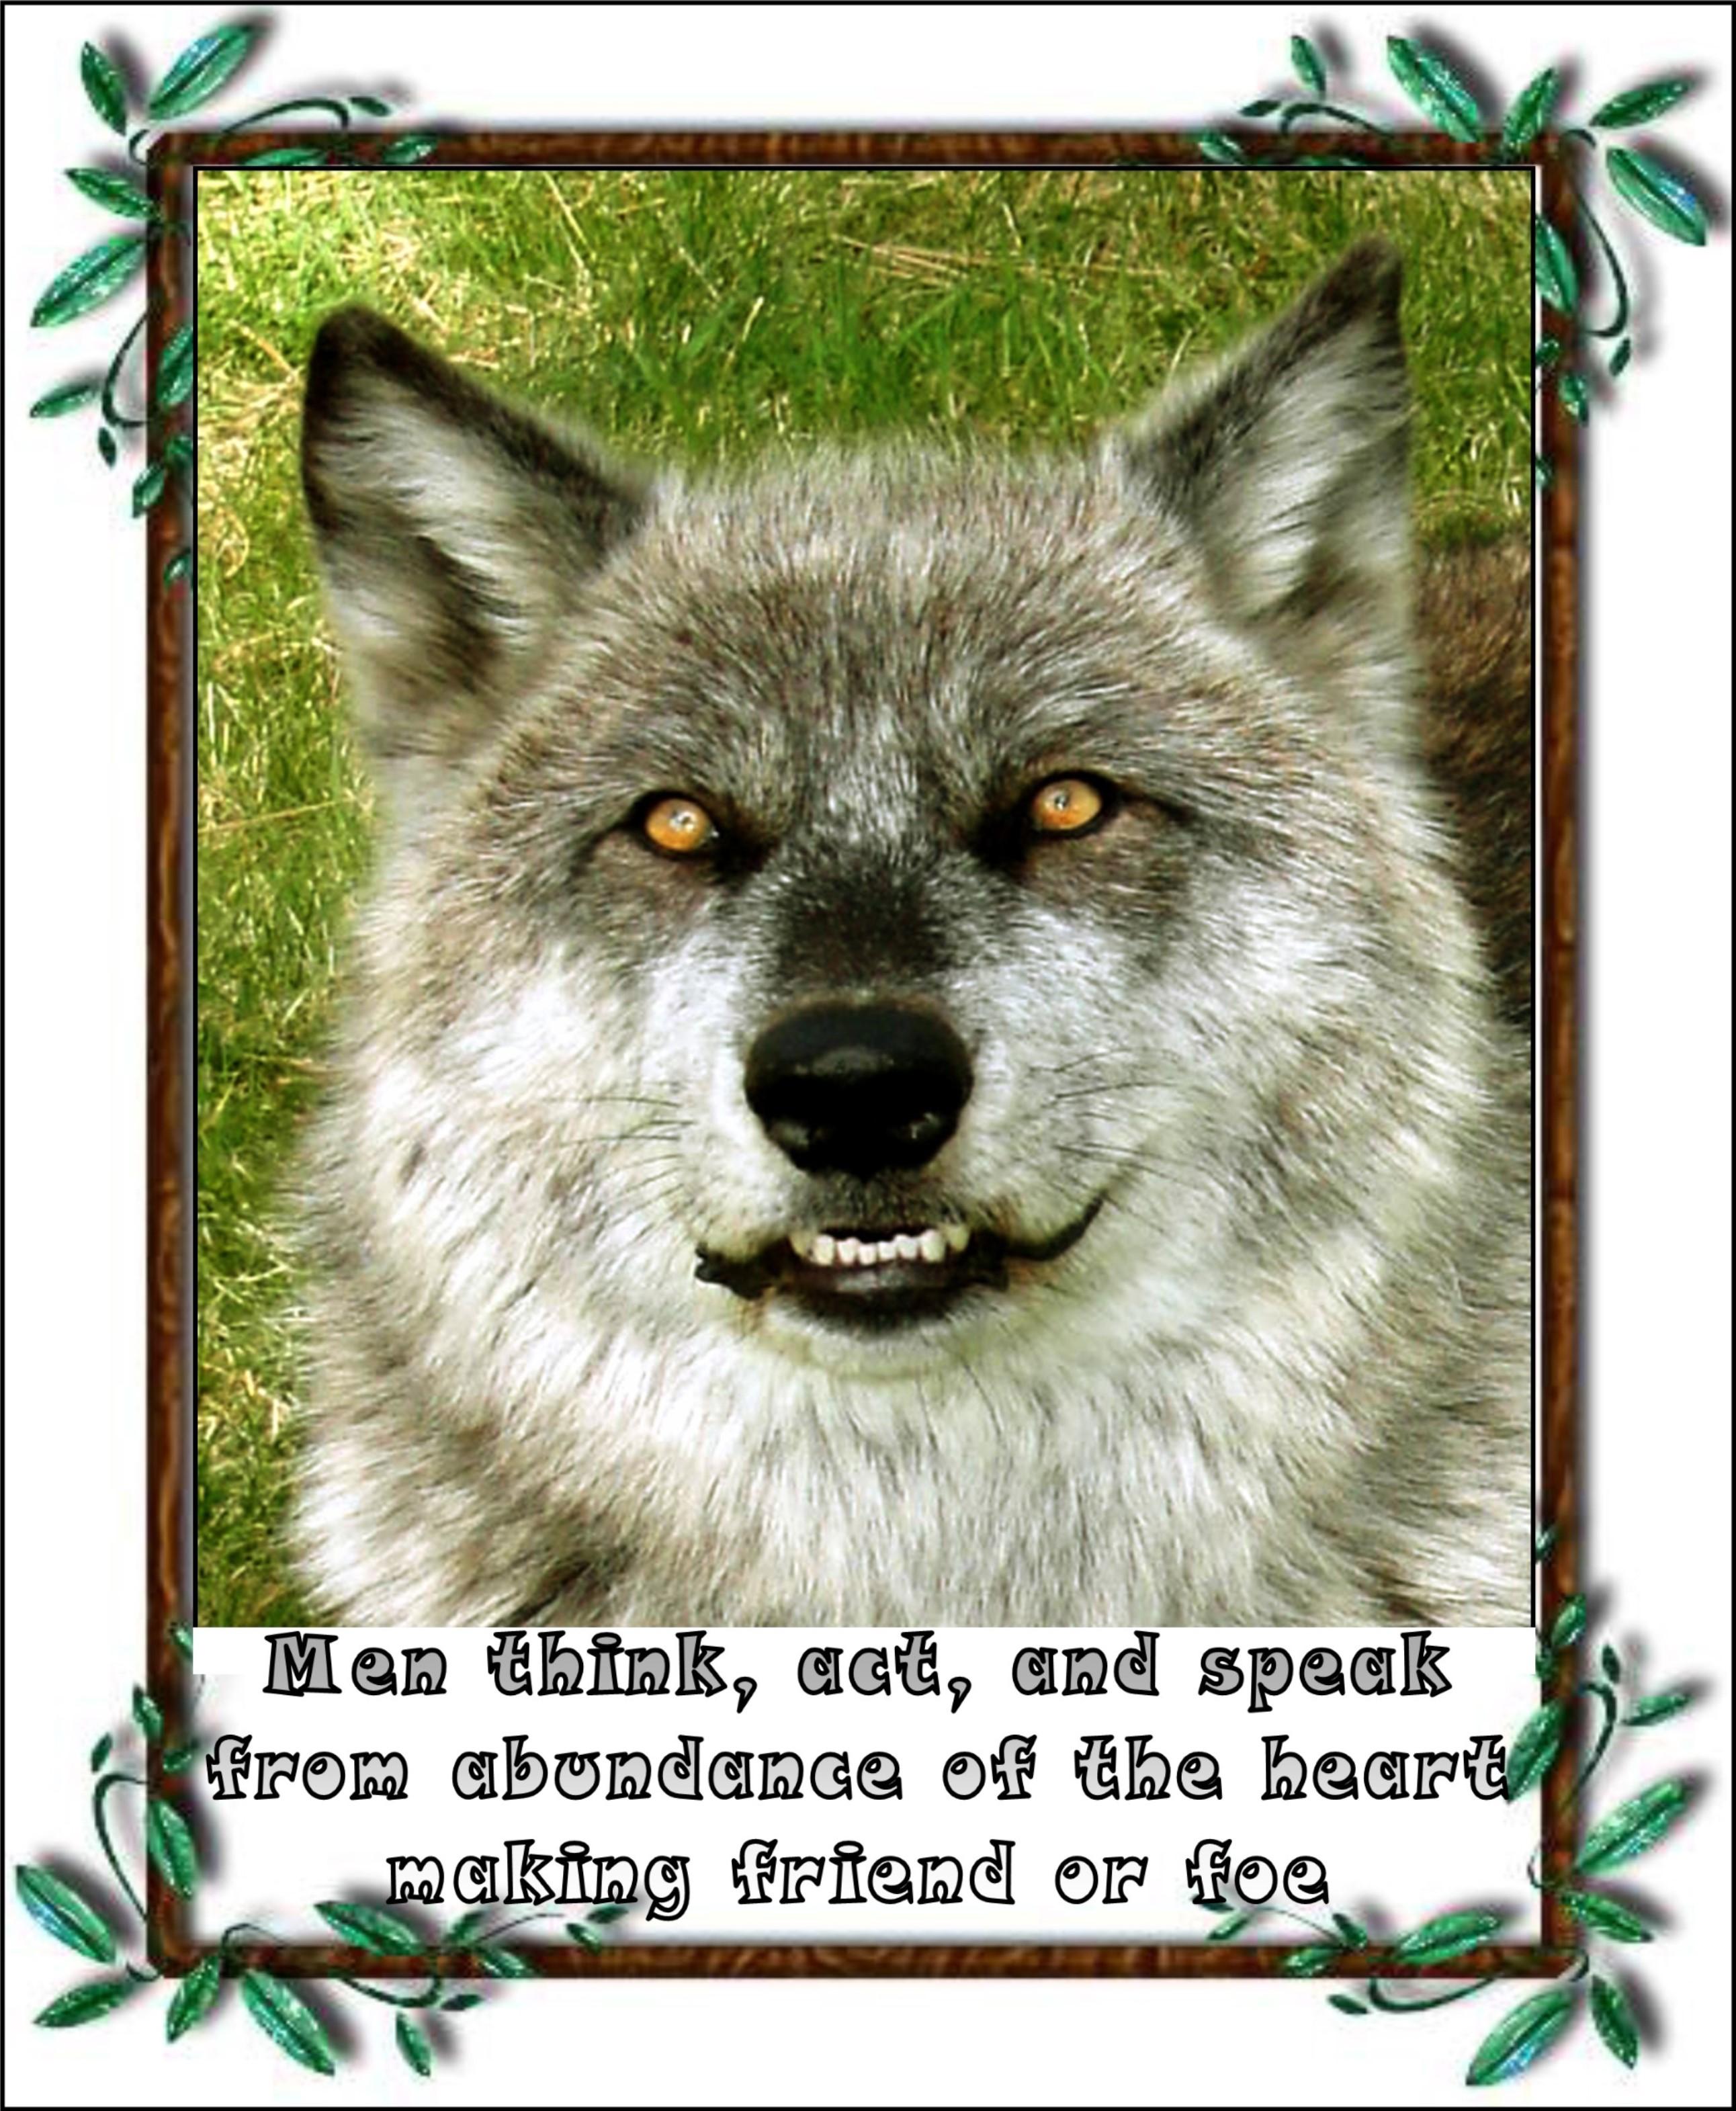 wolf   300 dpi  2014  lrg